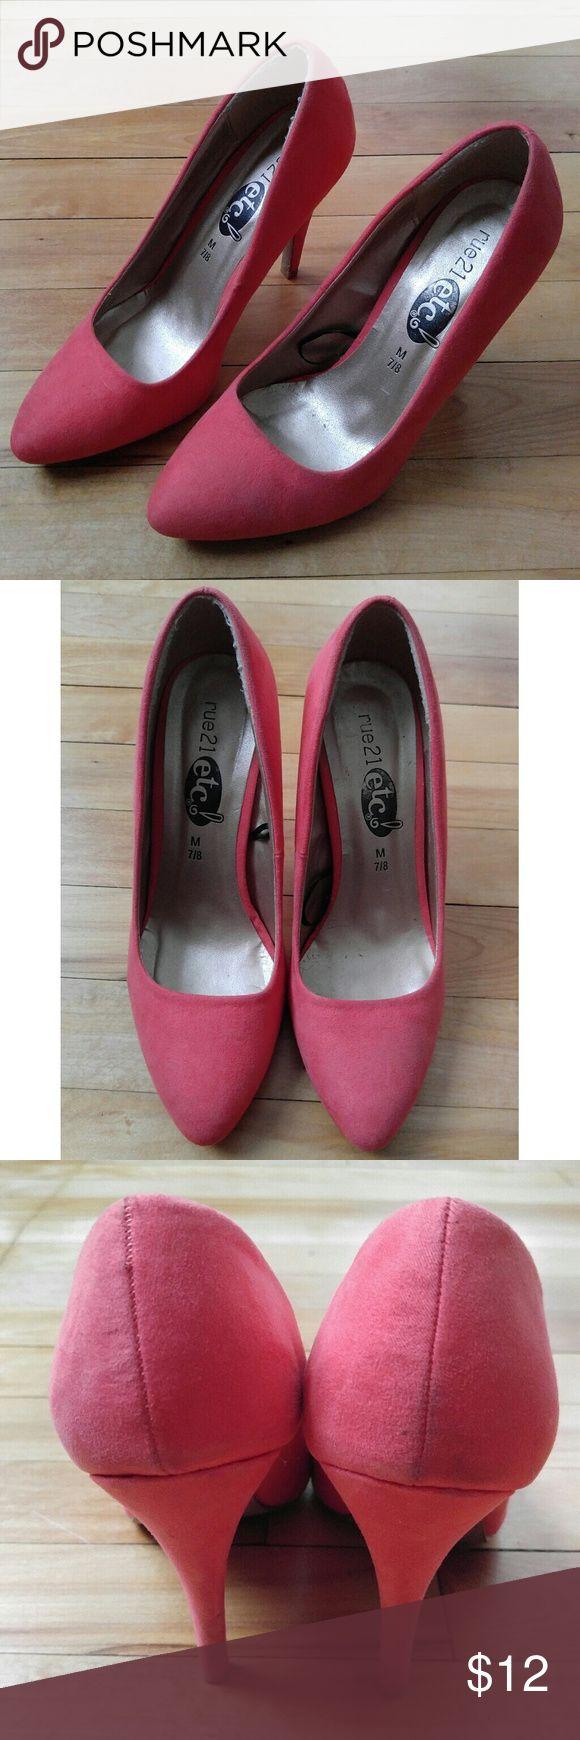 Rue 21 Coral heel 3.5 inch heel pointed toe Rue 21 etc! Semi-pointed toe coral heel 3.5 inch heel Rue 21 Shoes Heels